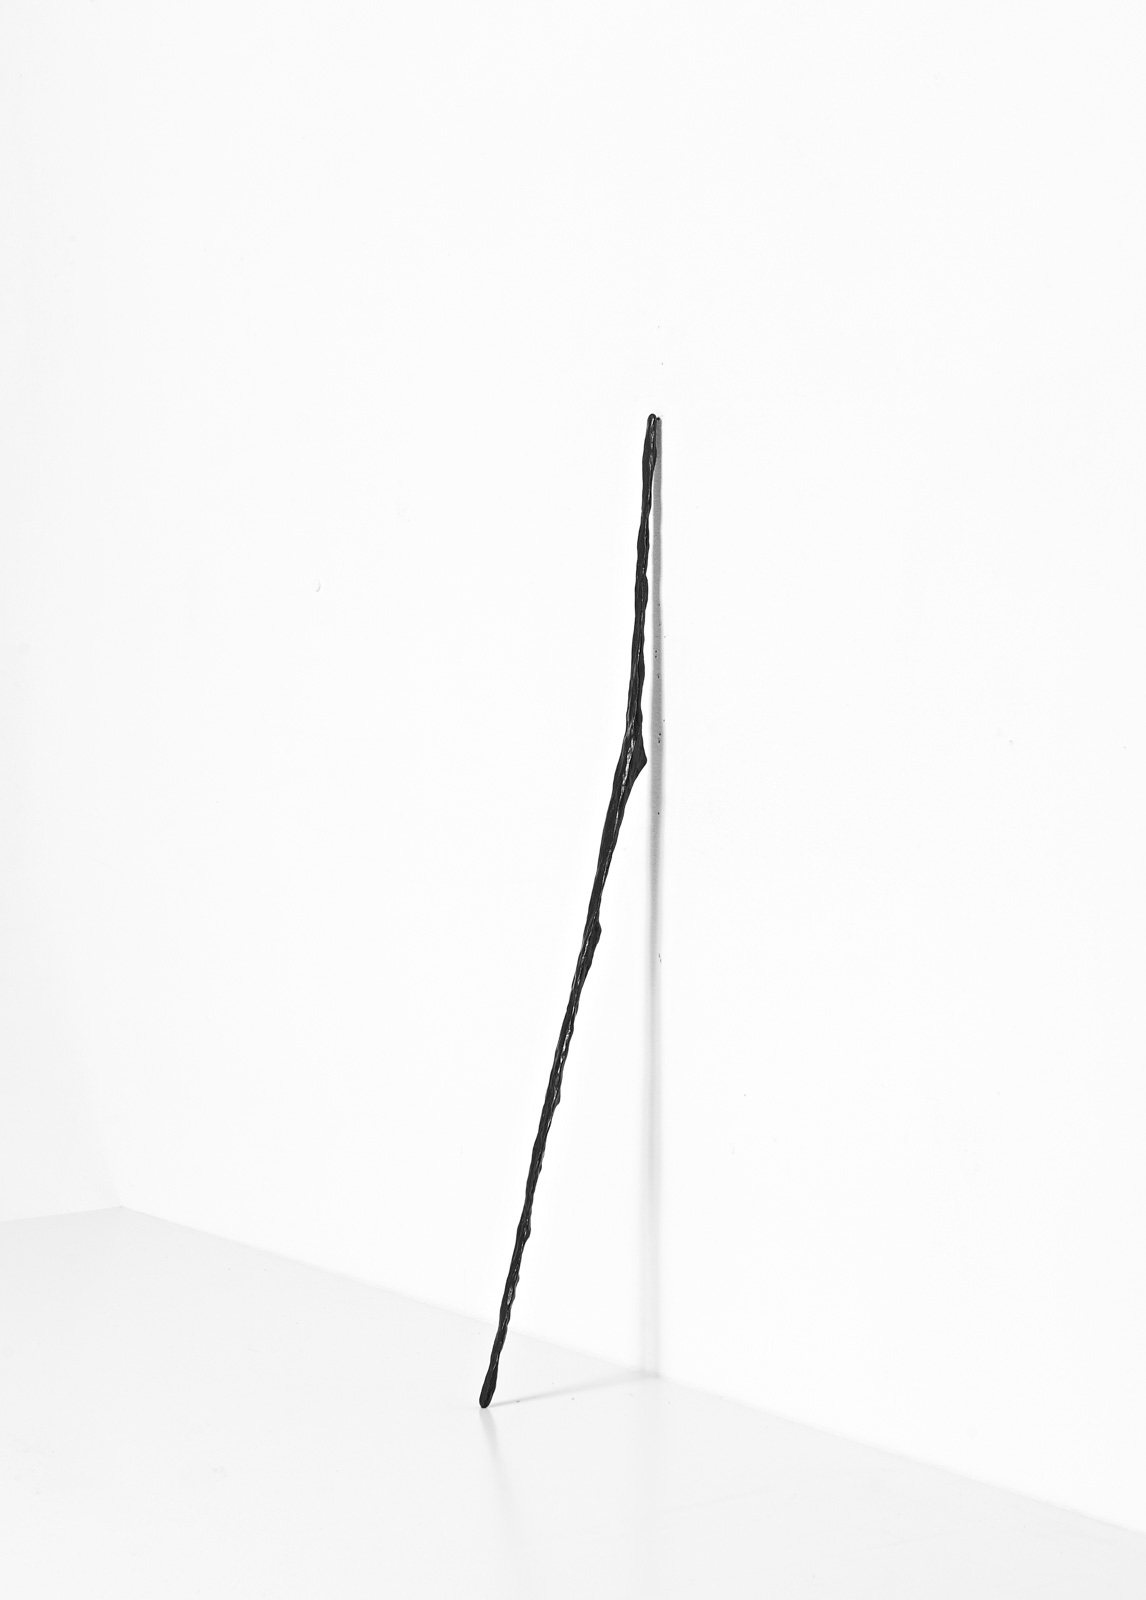 Sculpture V, 1991, bronze, height 63,5, ed. 6 (JG s 24)